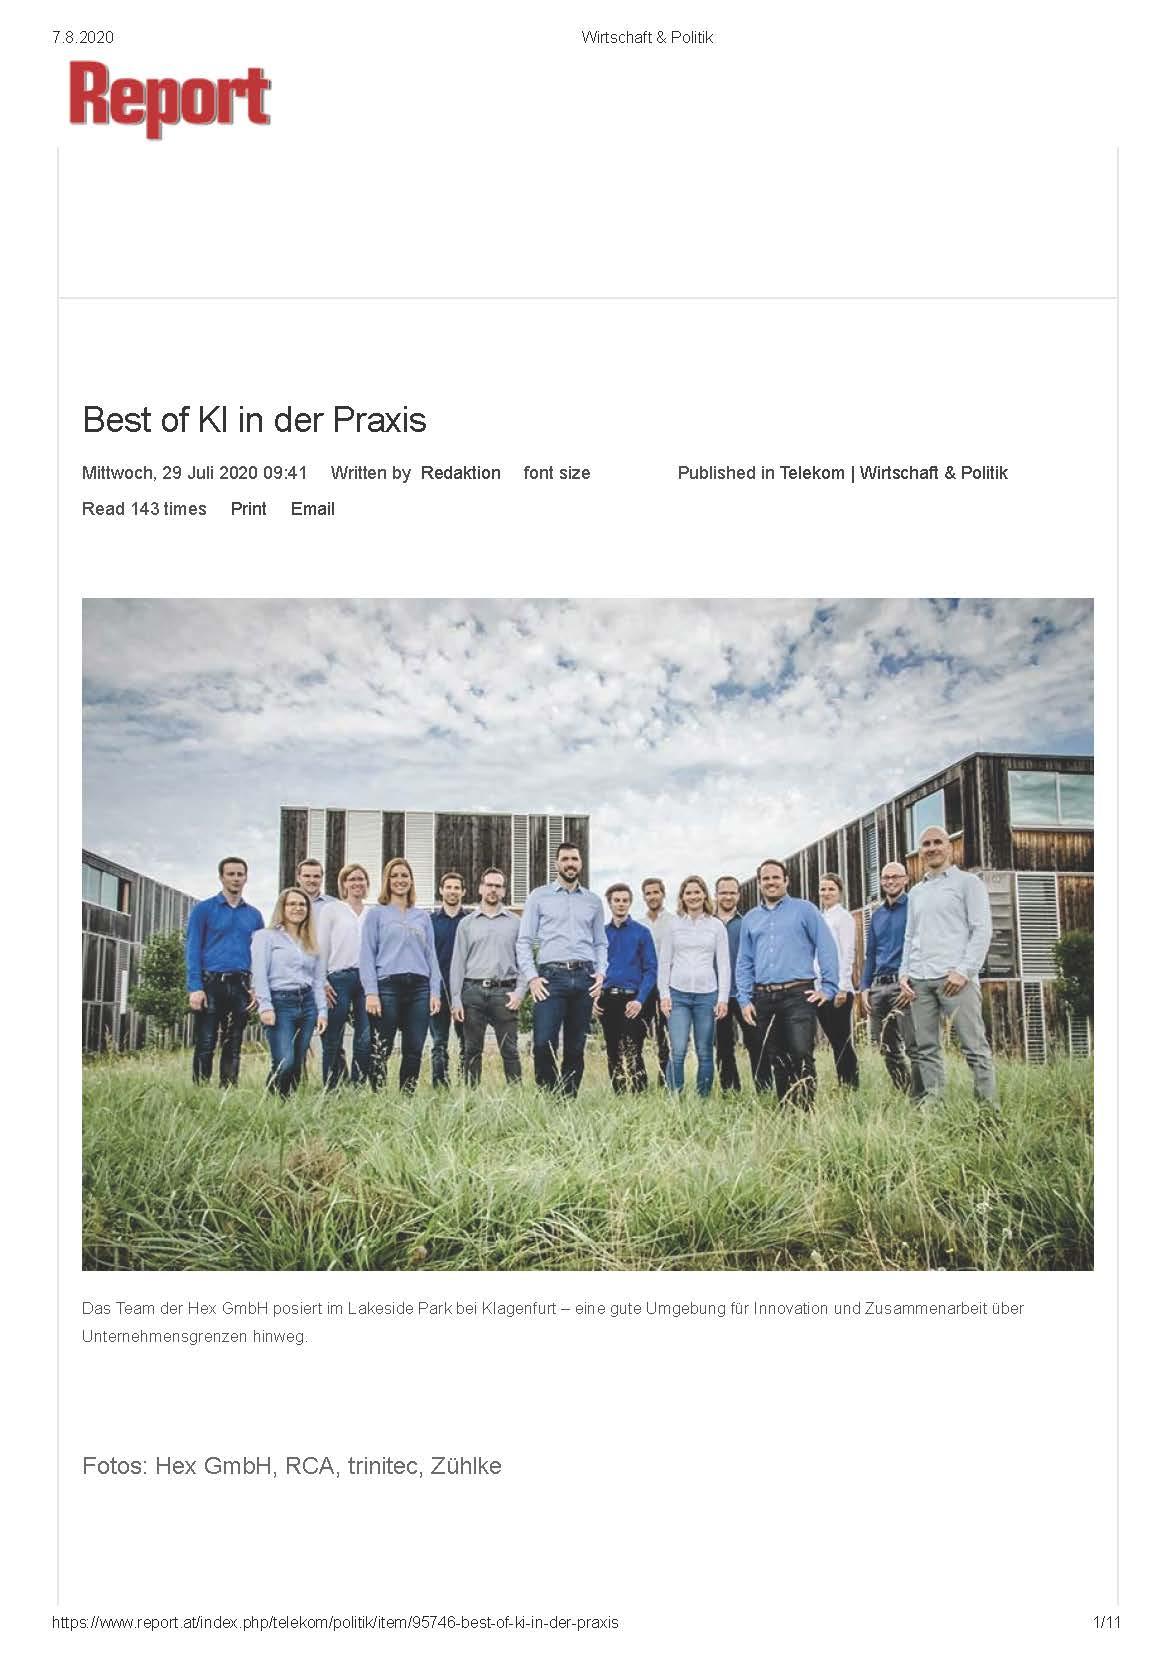 2020-08-07_Report.at_Best of KI in der Praxis_Seite_1